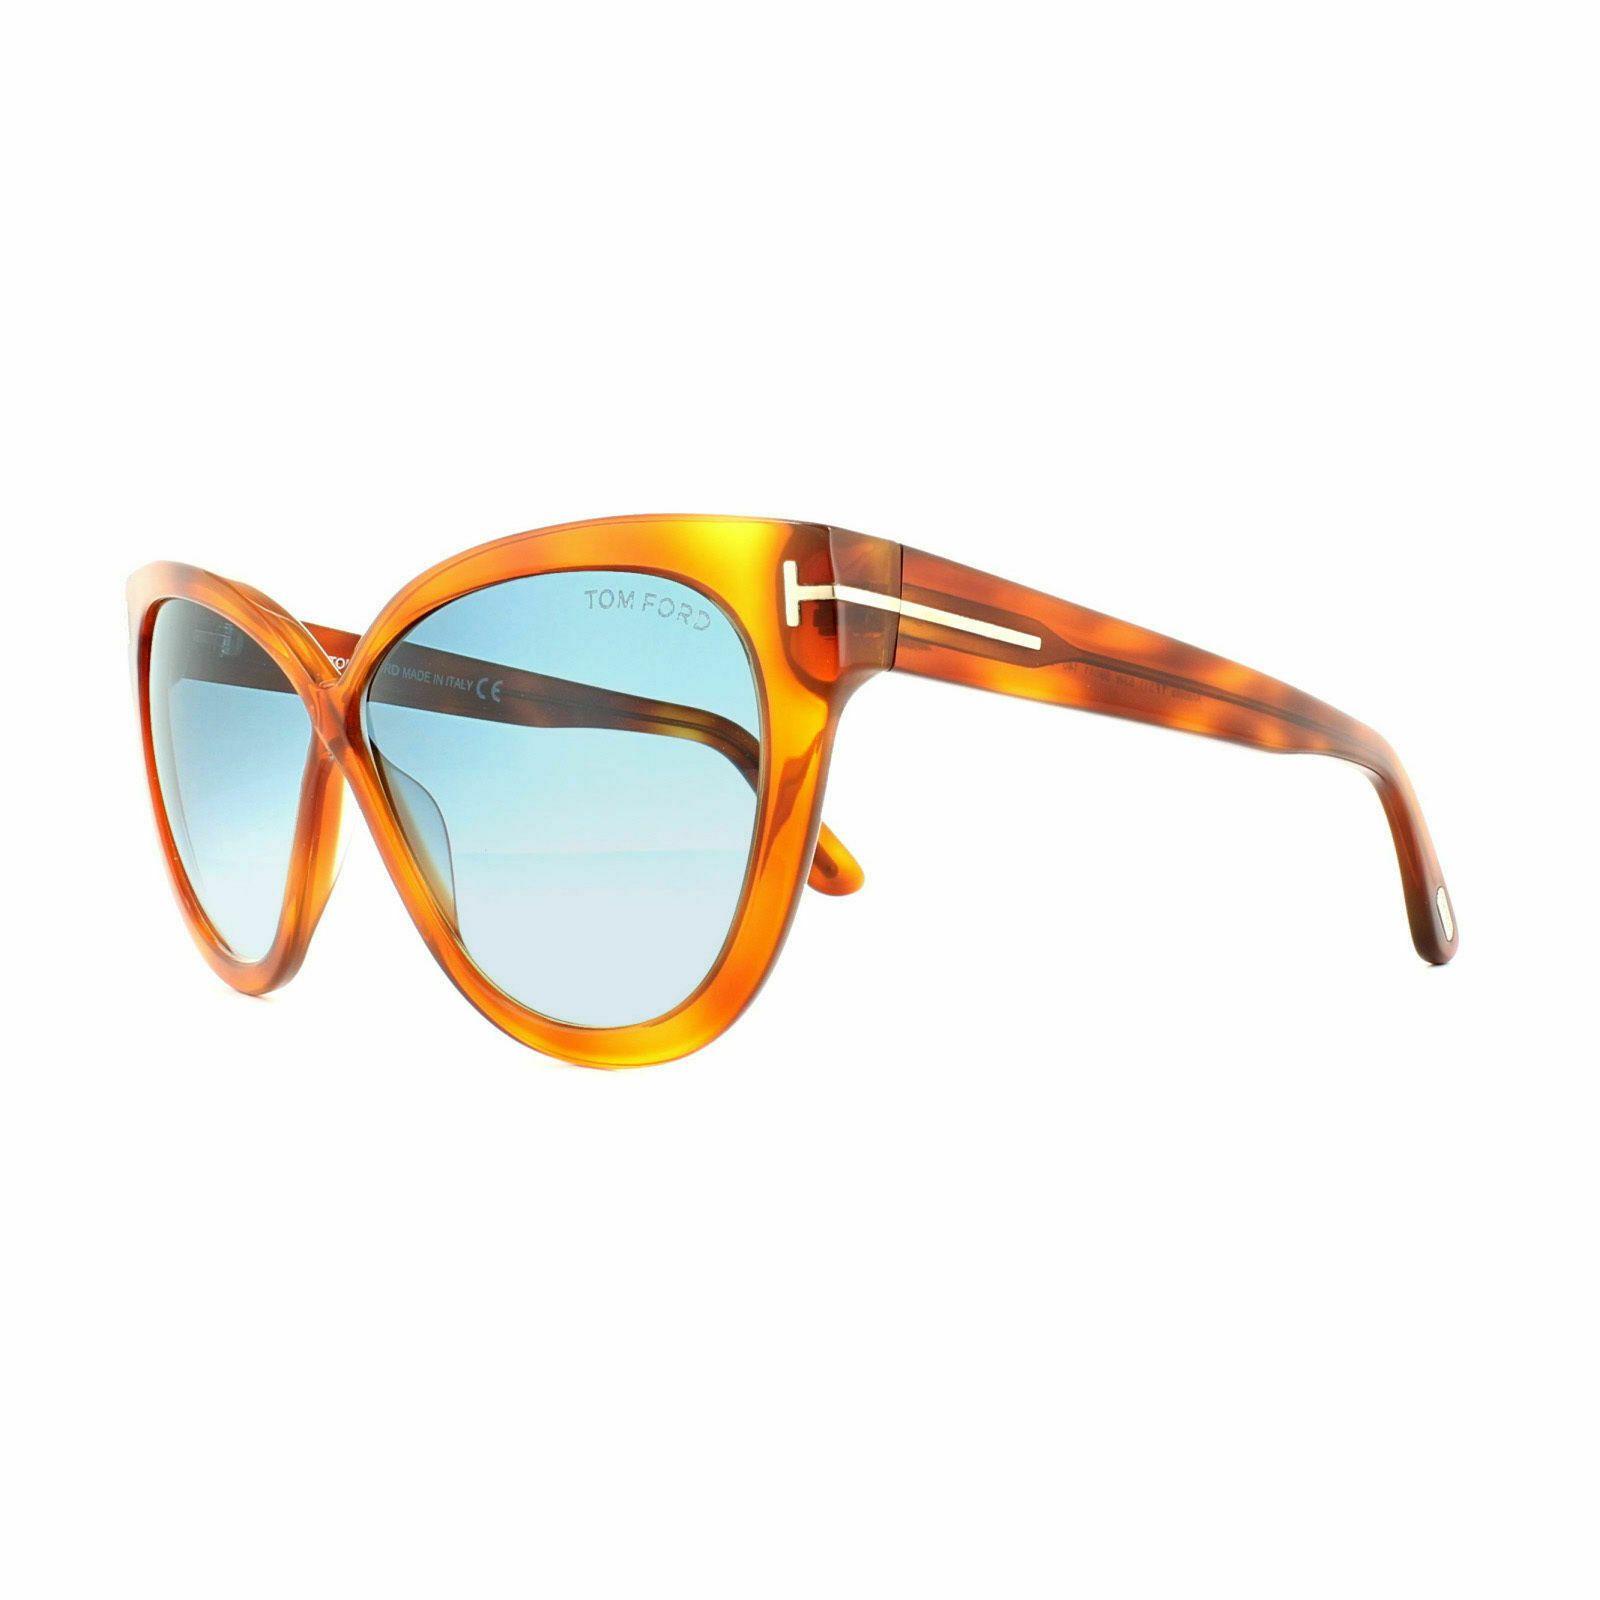 Tom Ford Mujer Cat Eye Gafas de Sol TF0511 53W Havana Marco Azul Degradado Lente ,  Tom Ford Mujer